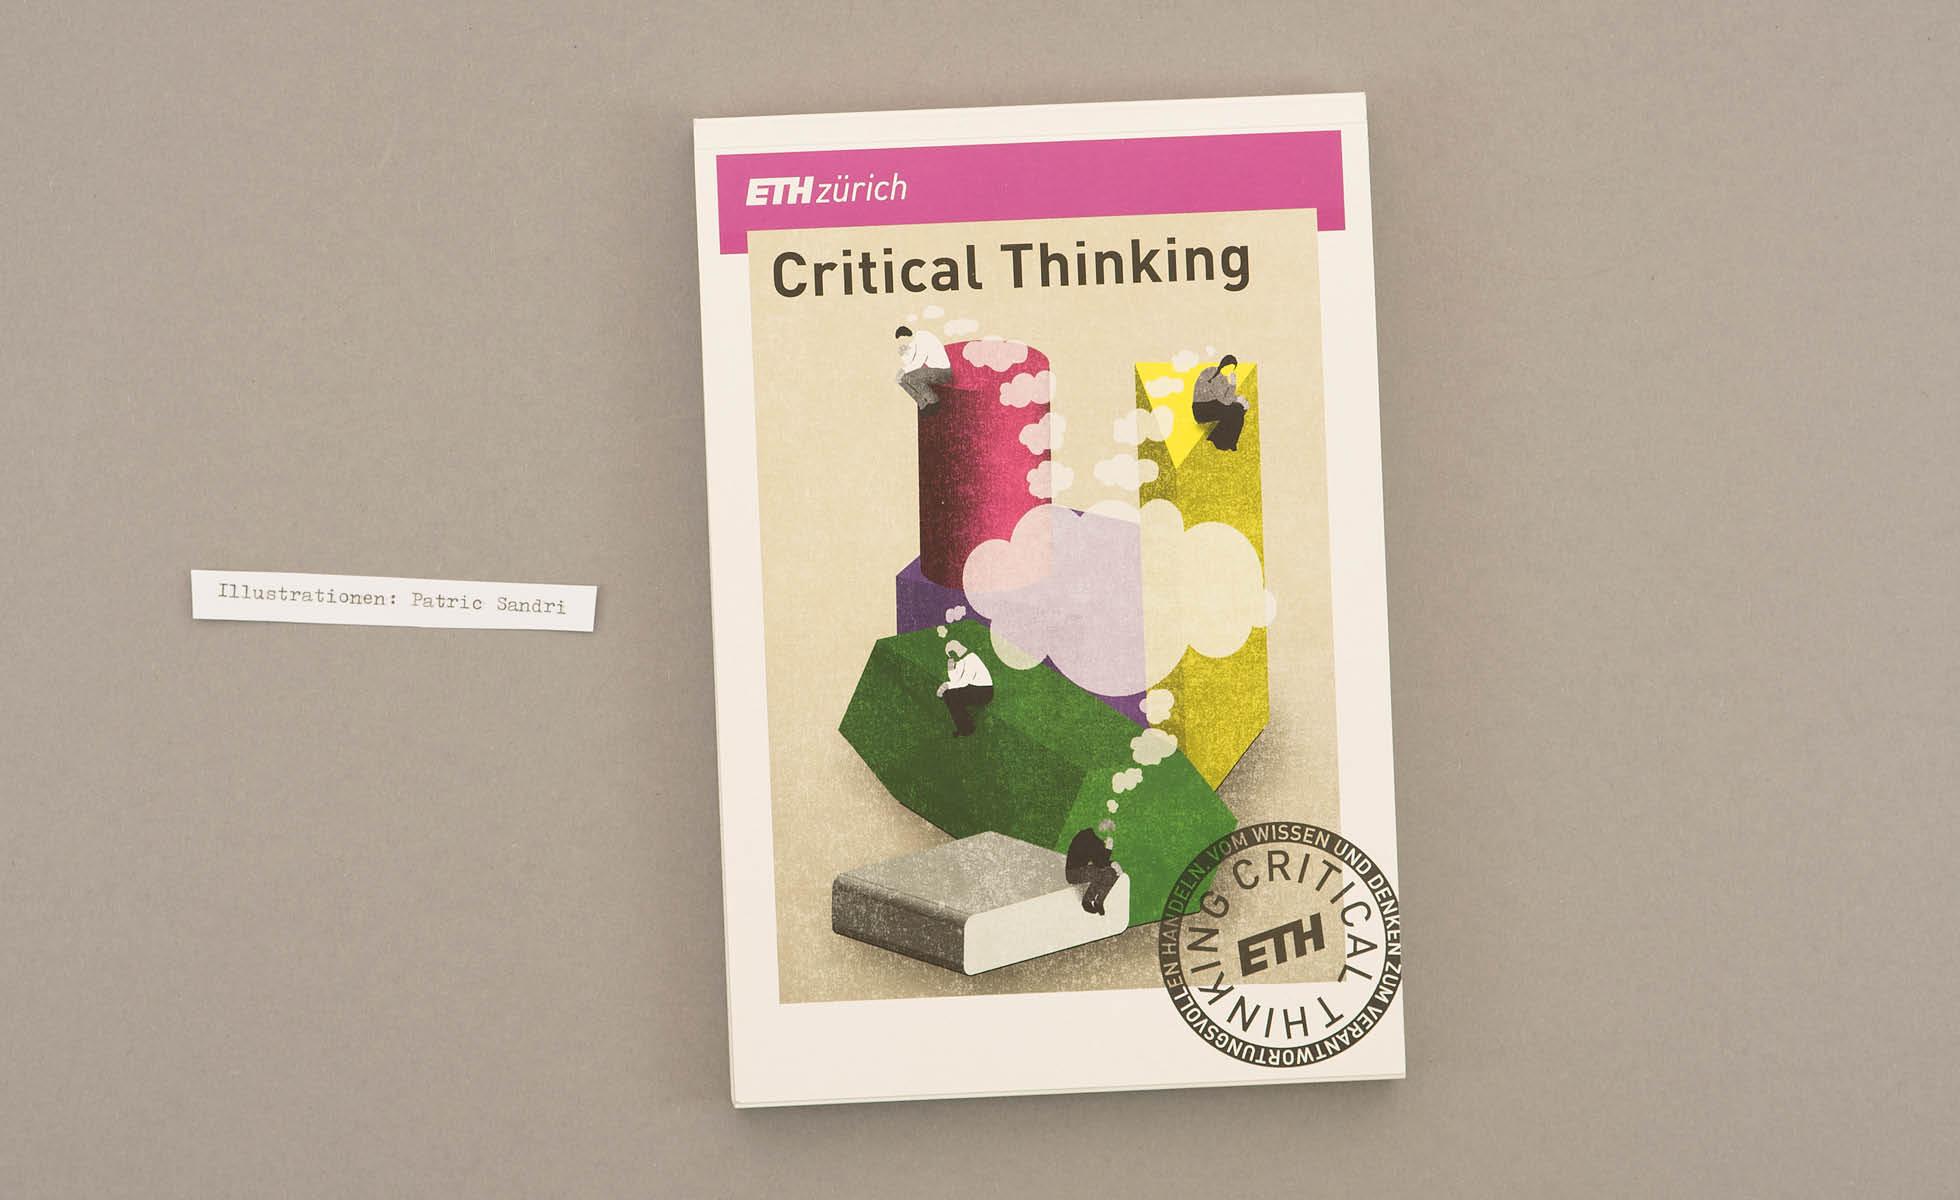 critical_thinking_01_eth_01